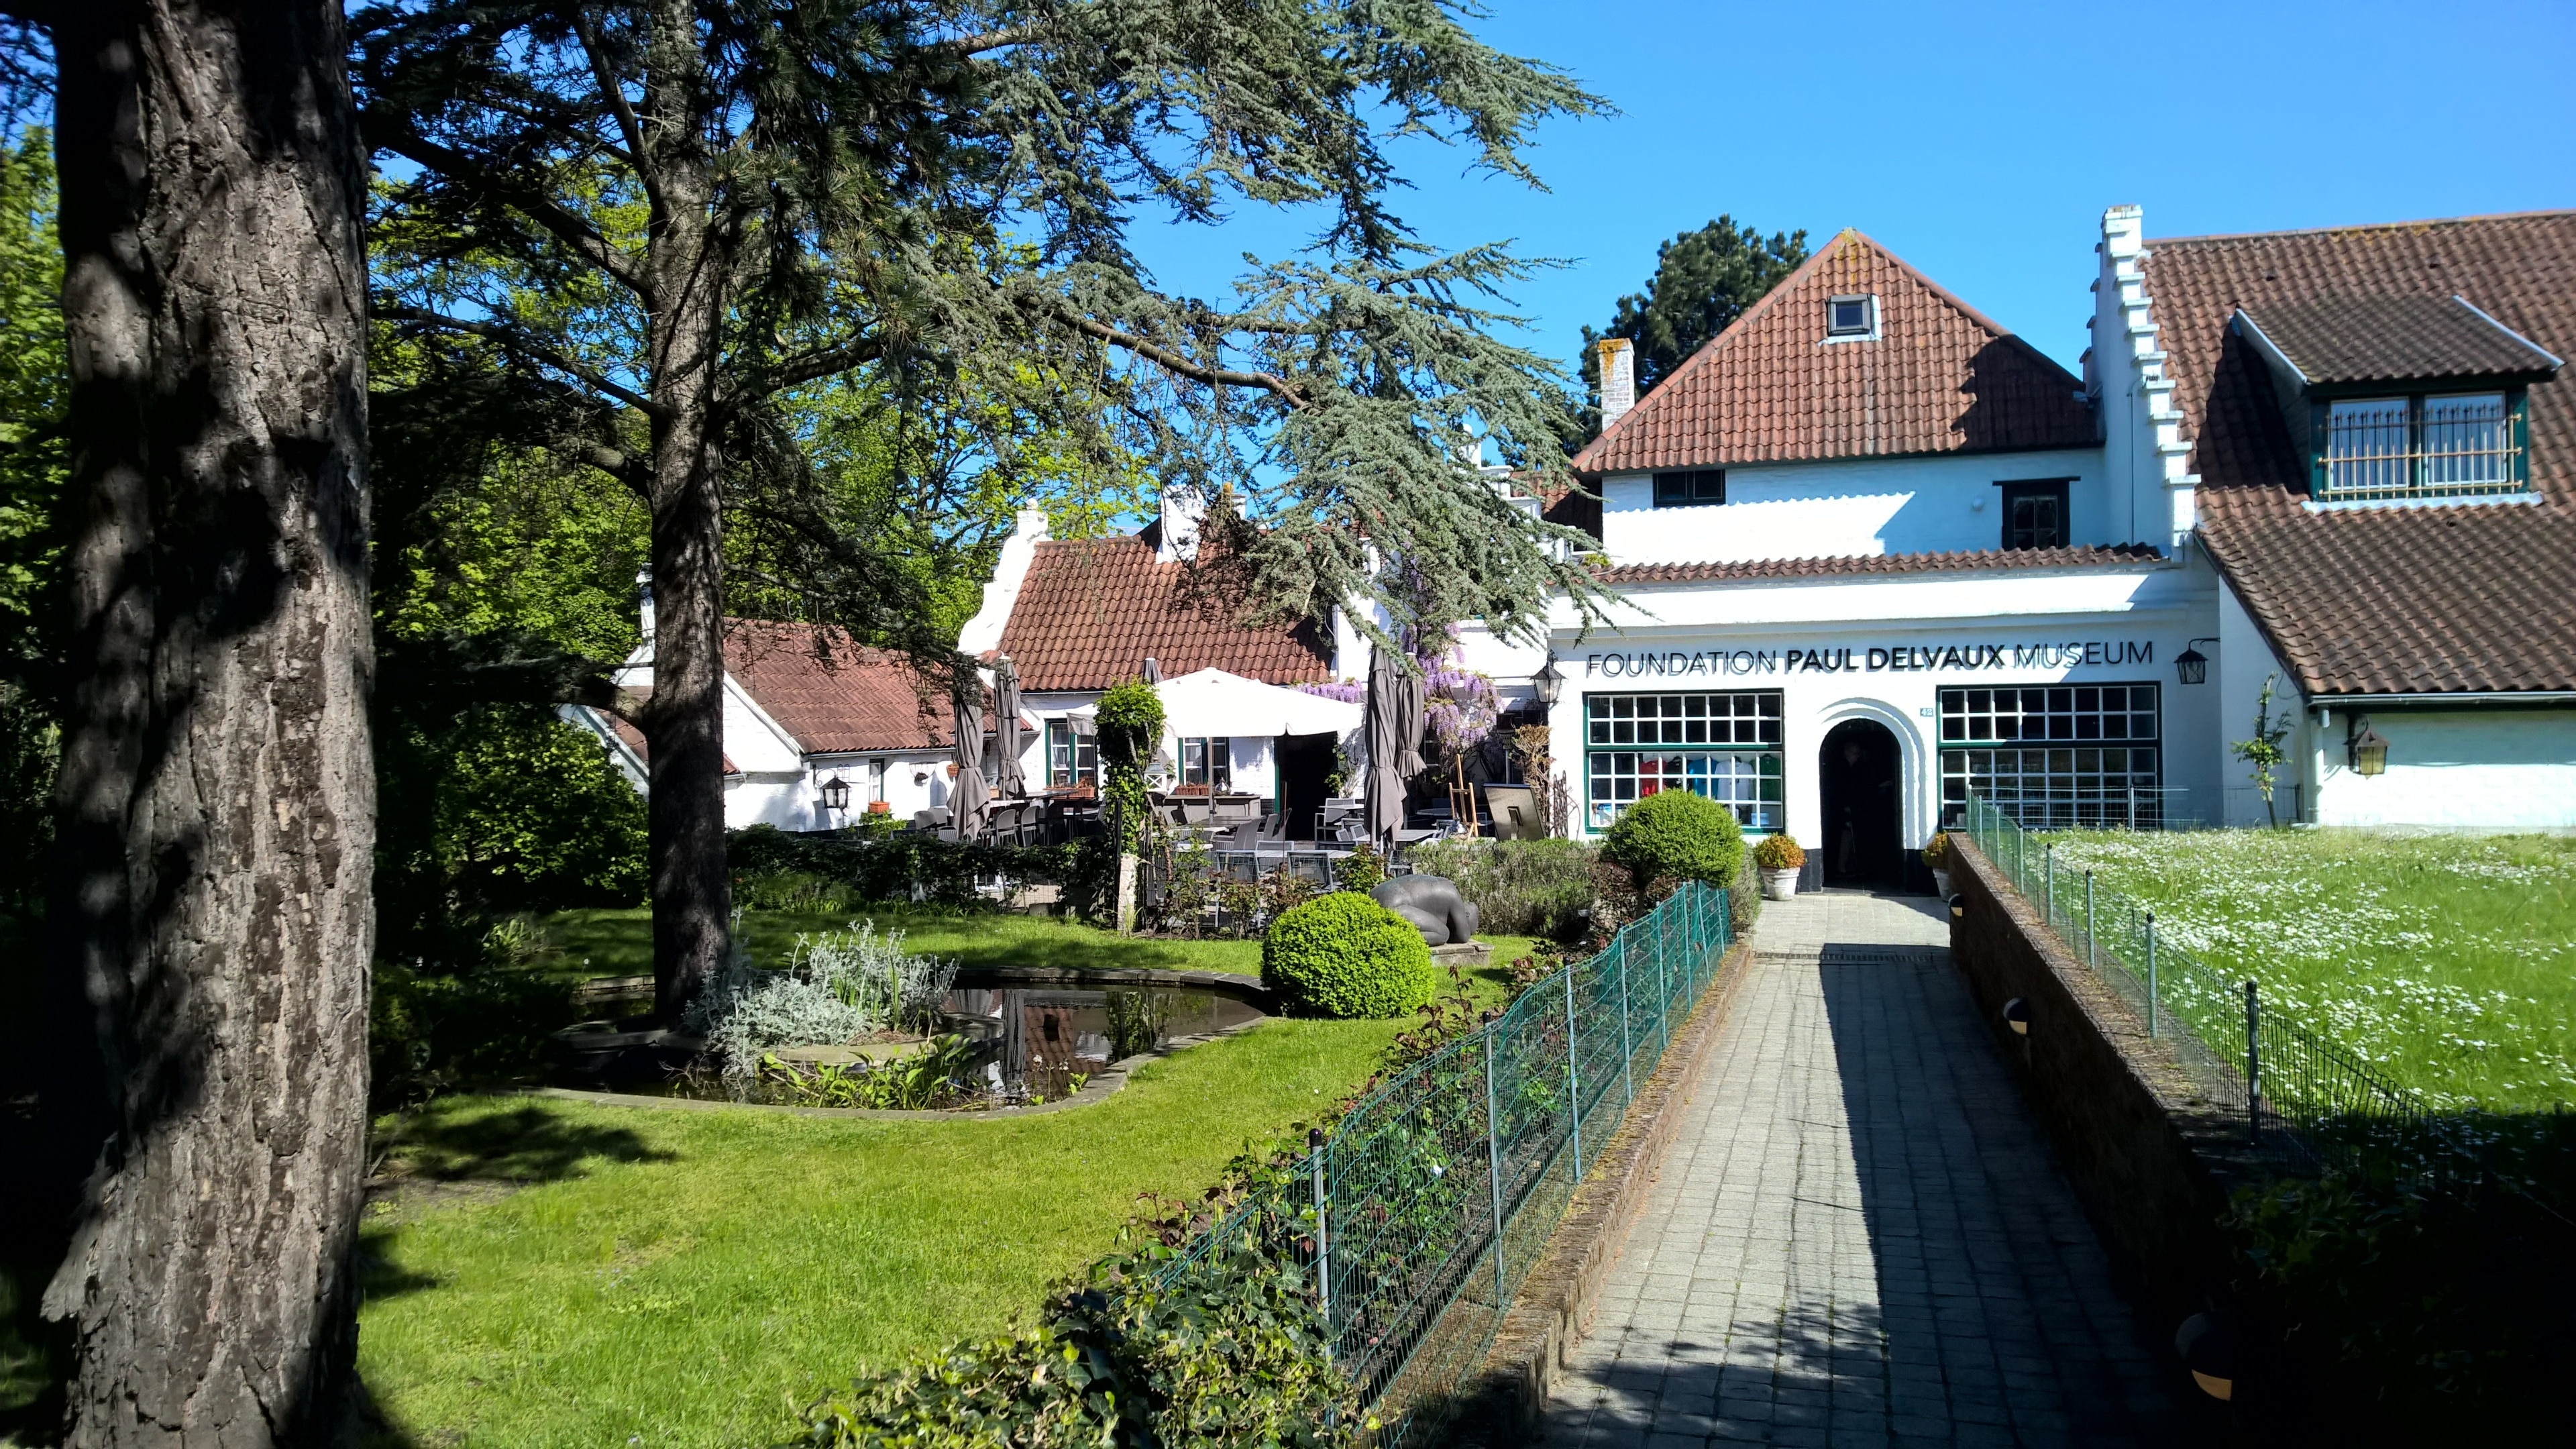 Koksijde, Bezirk Flandern, Belgien